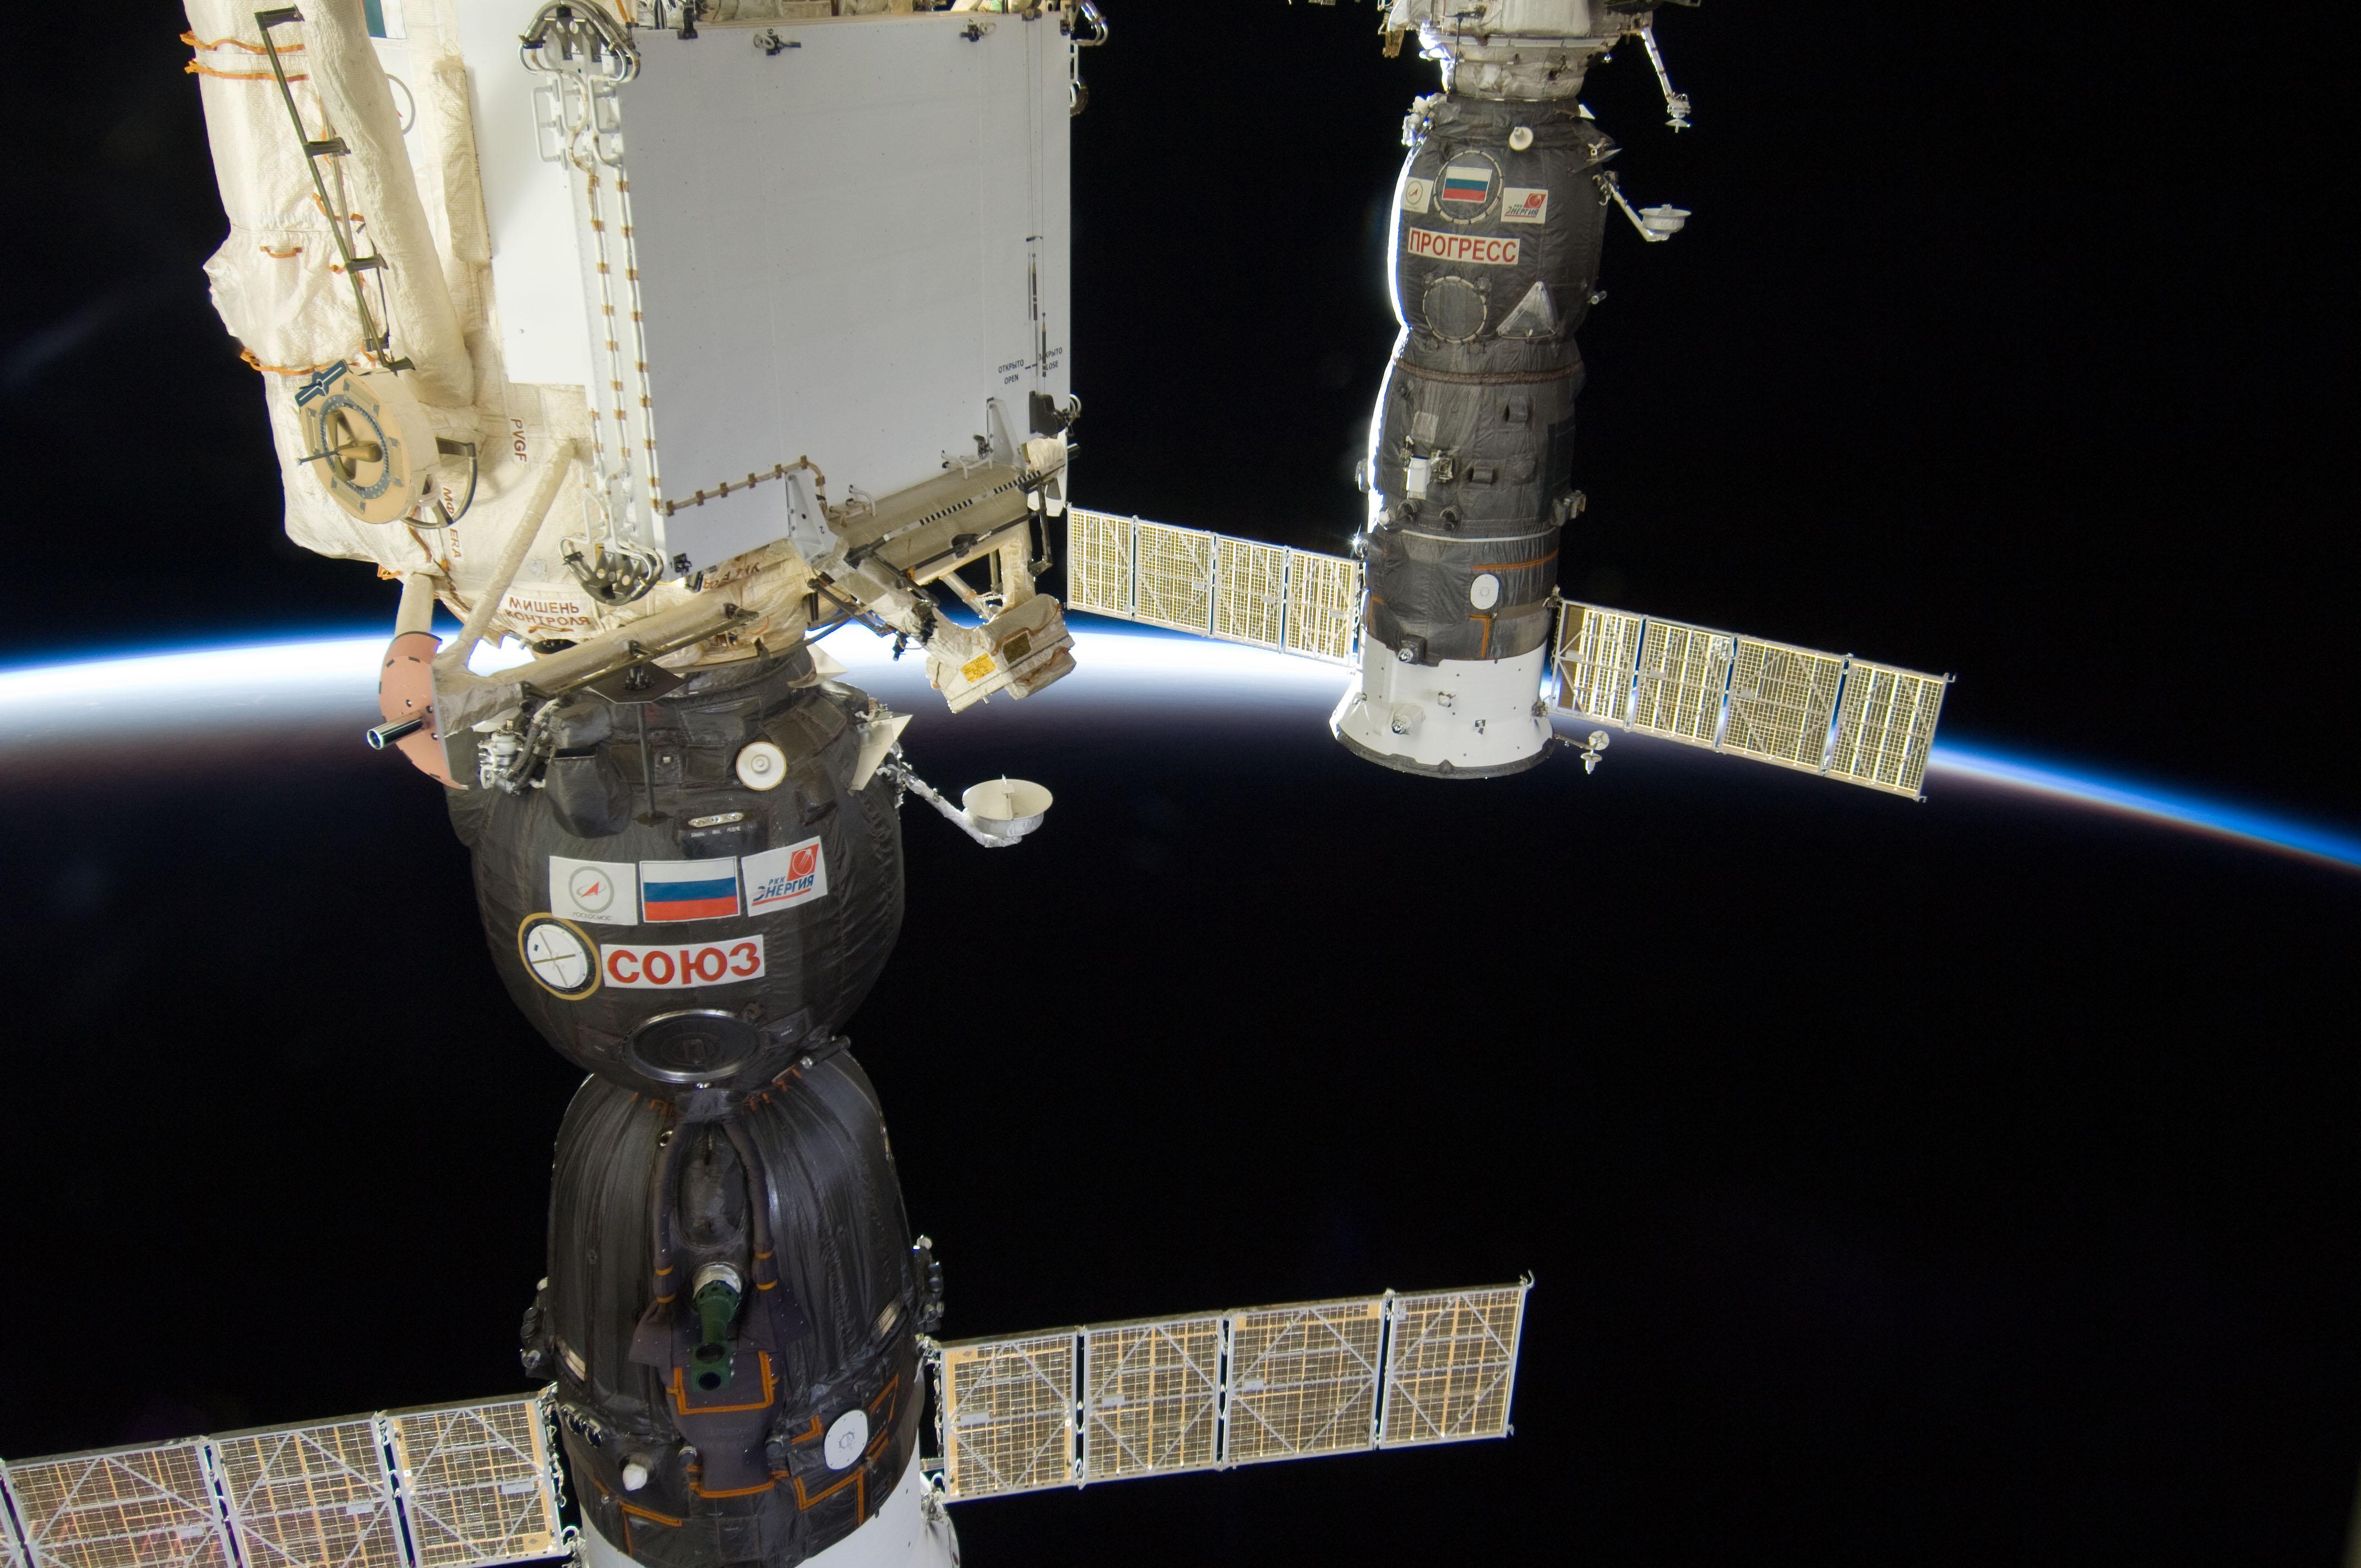 File:ISS-30 Soyuz TMA-03M and Progress M-13M.jpg ...